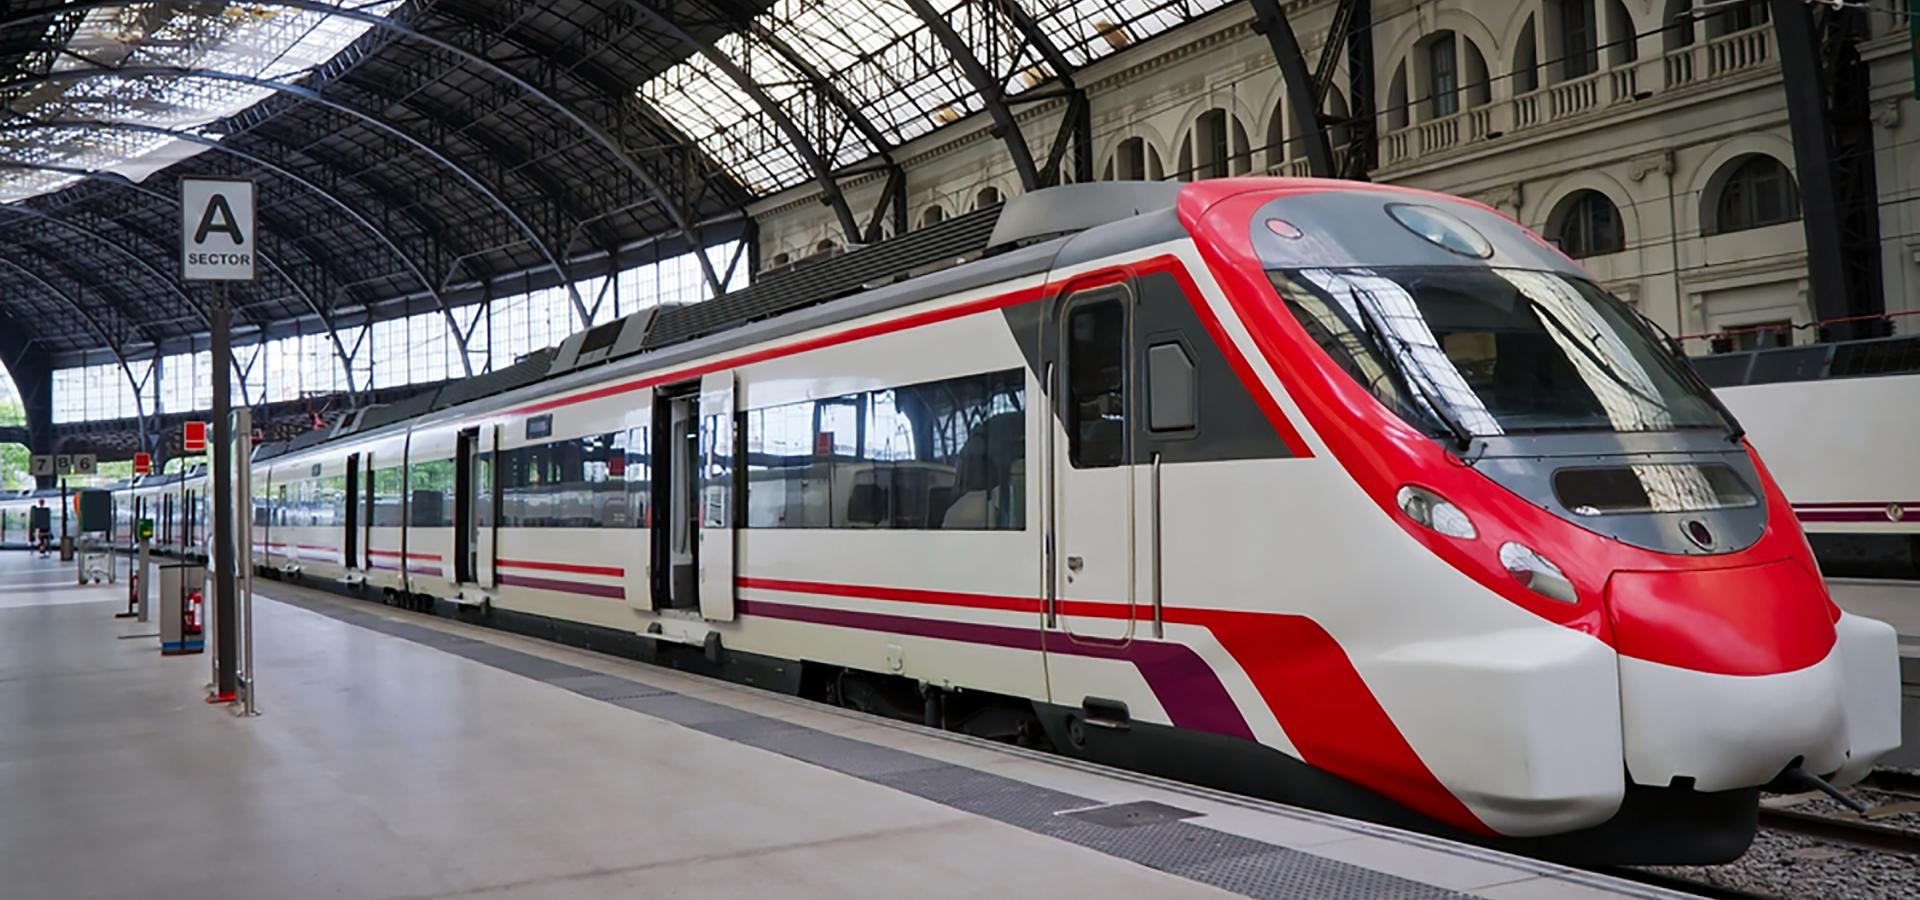 train-at-station1920x900